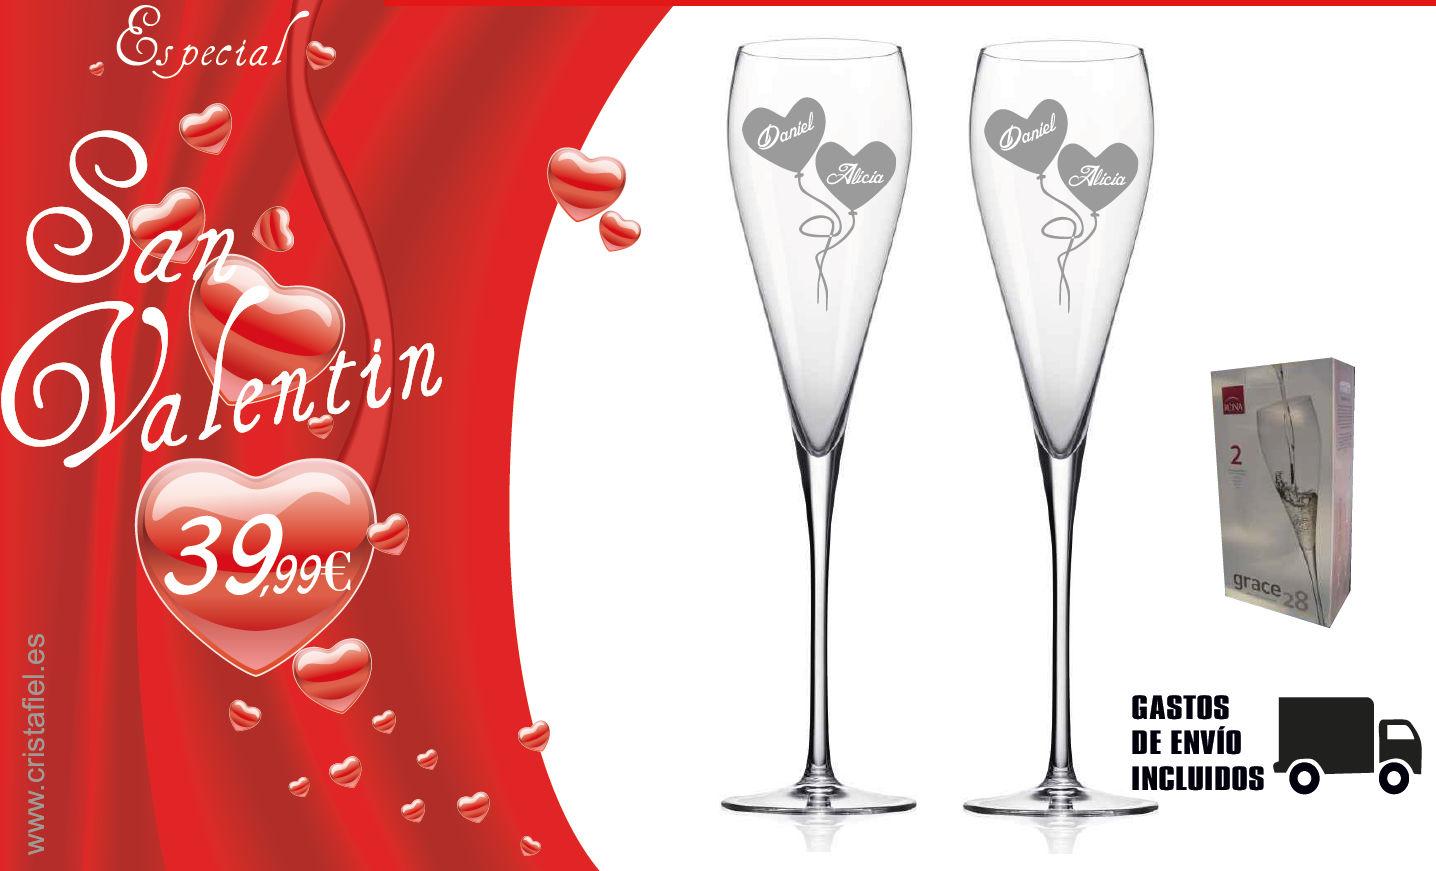 Cristafiel Grabados - Oferta Especial San Valentin 2019 - Copa Grace Champagne Flute